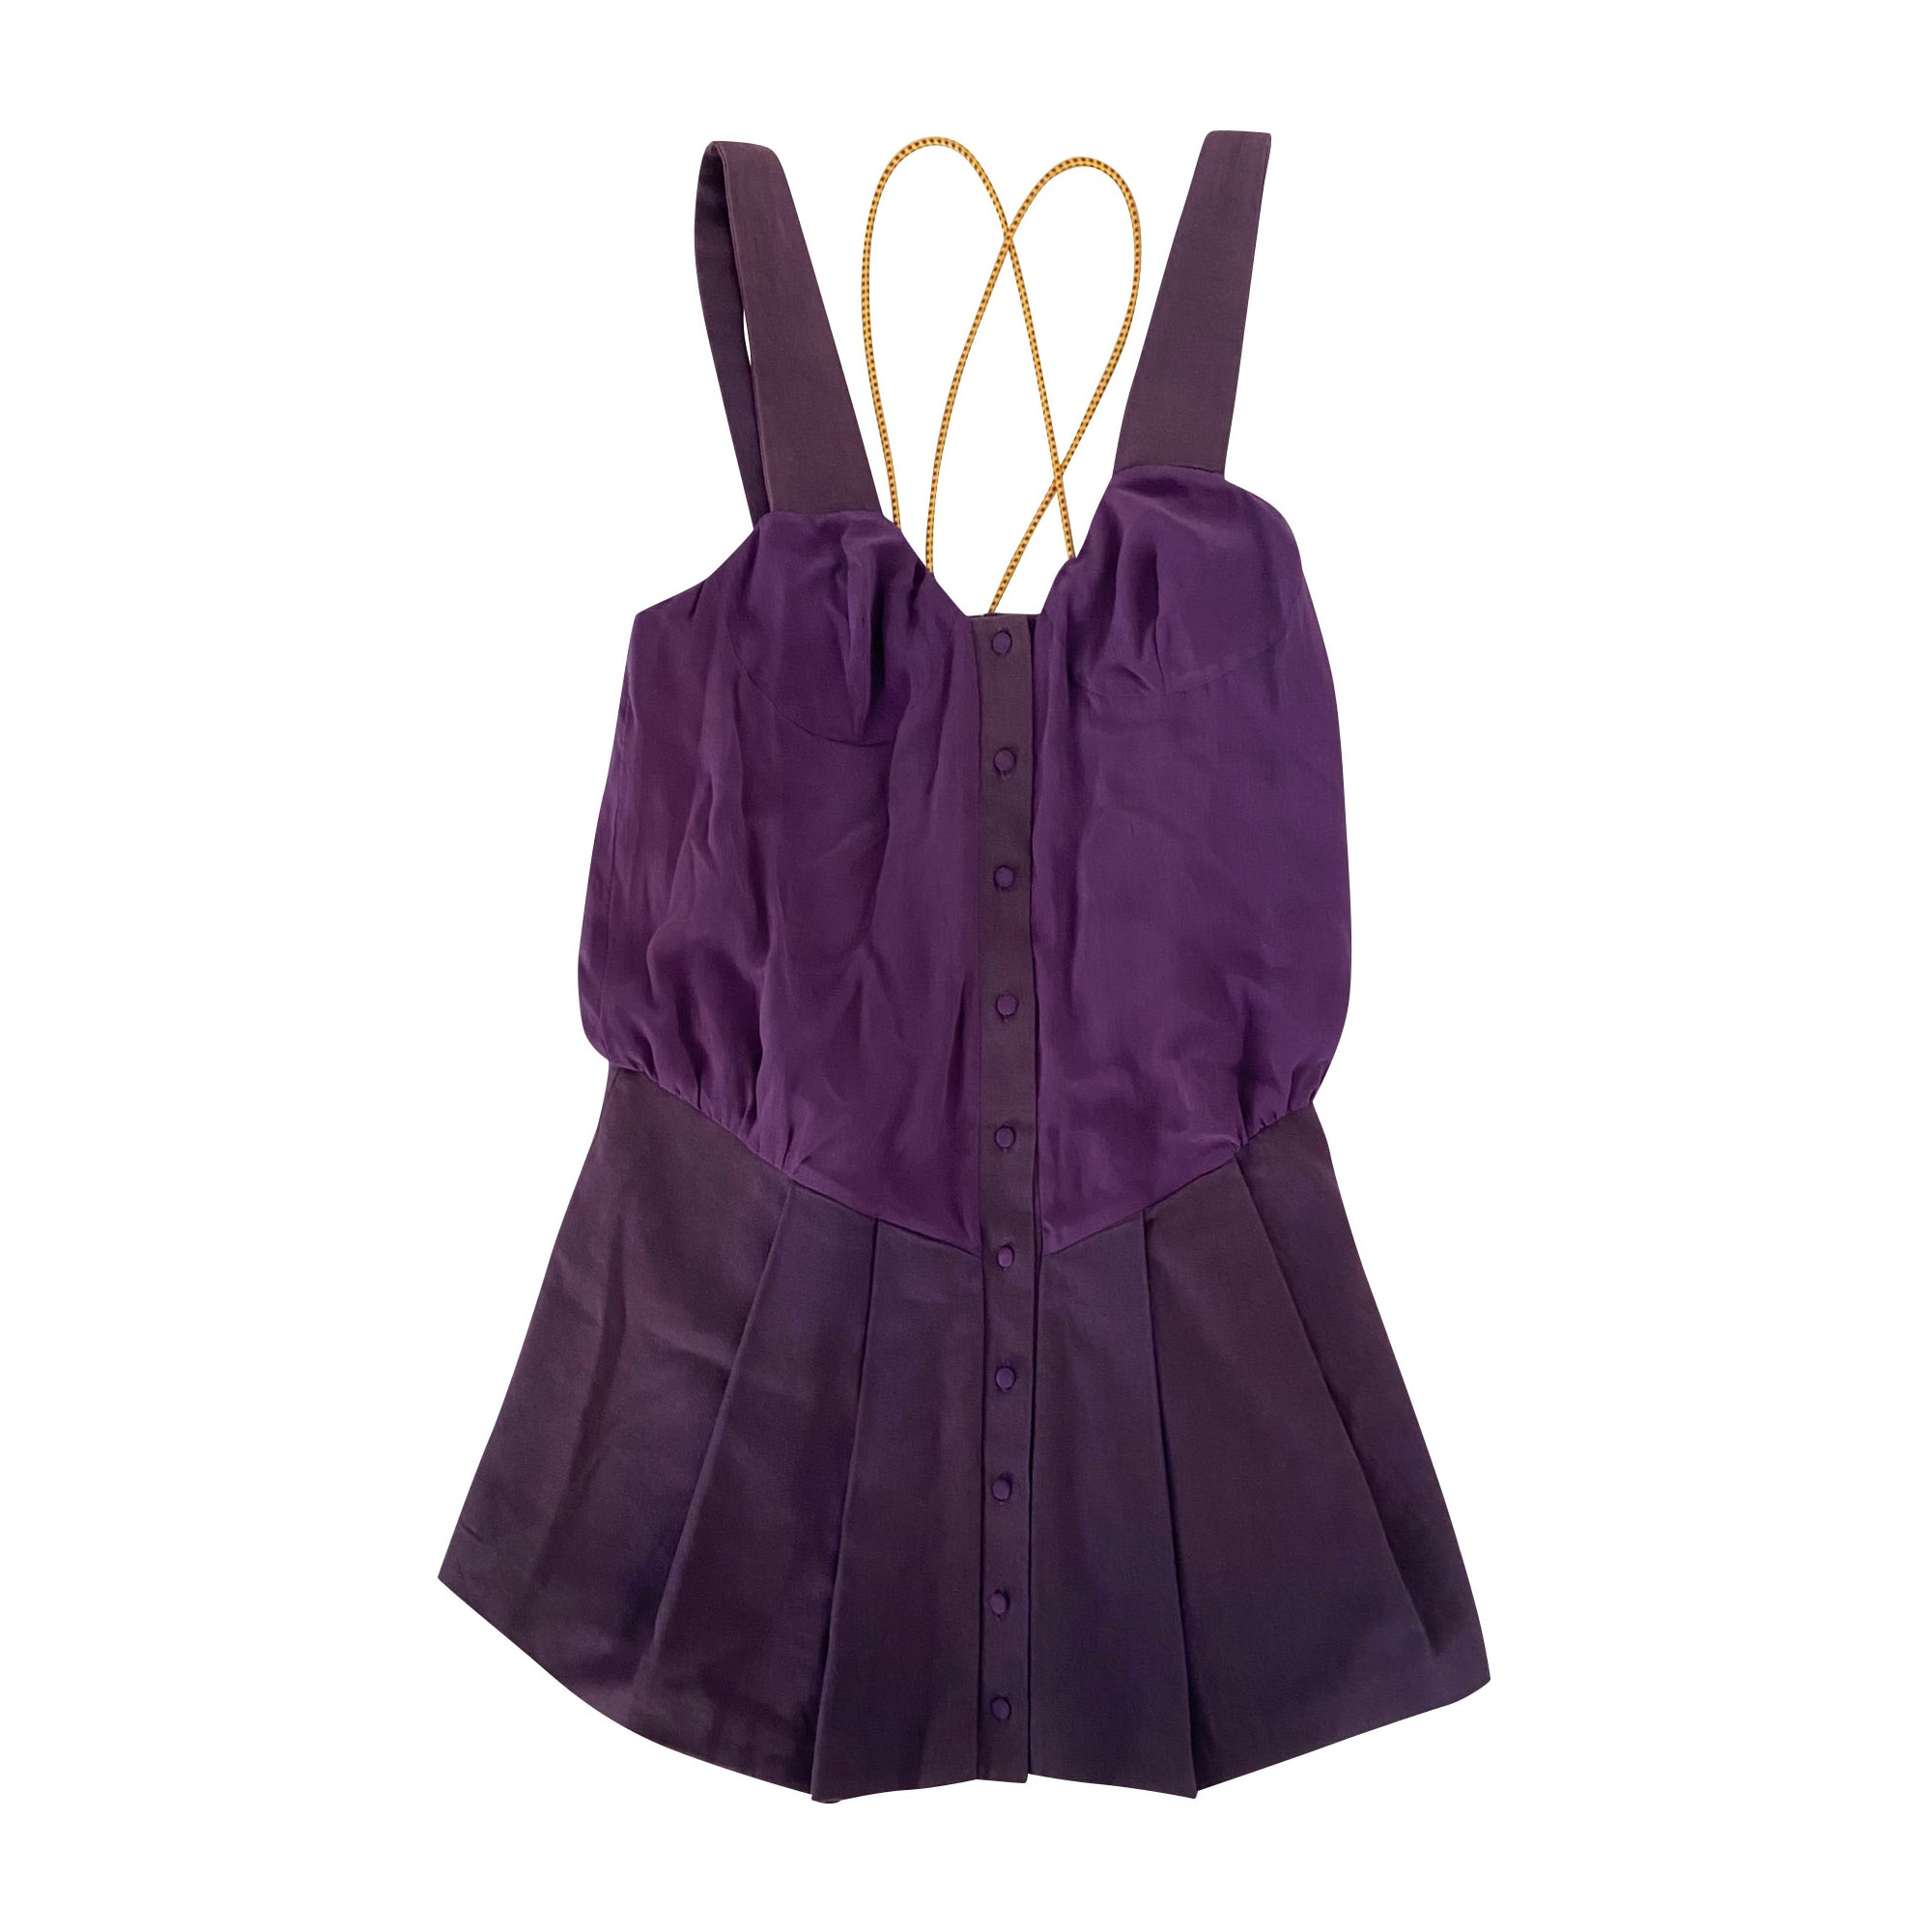 Robe courte HEIMSTONE Violet, mauve, lavande